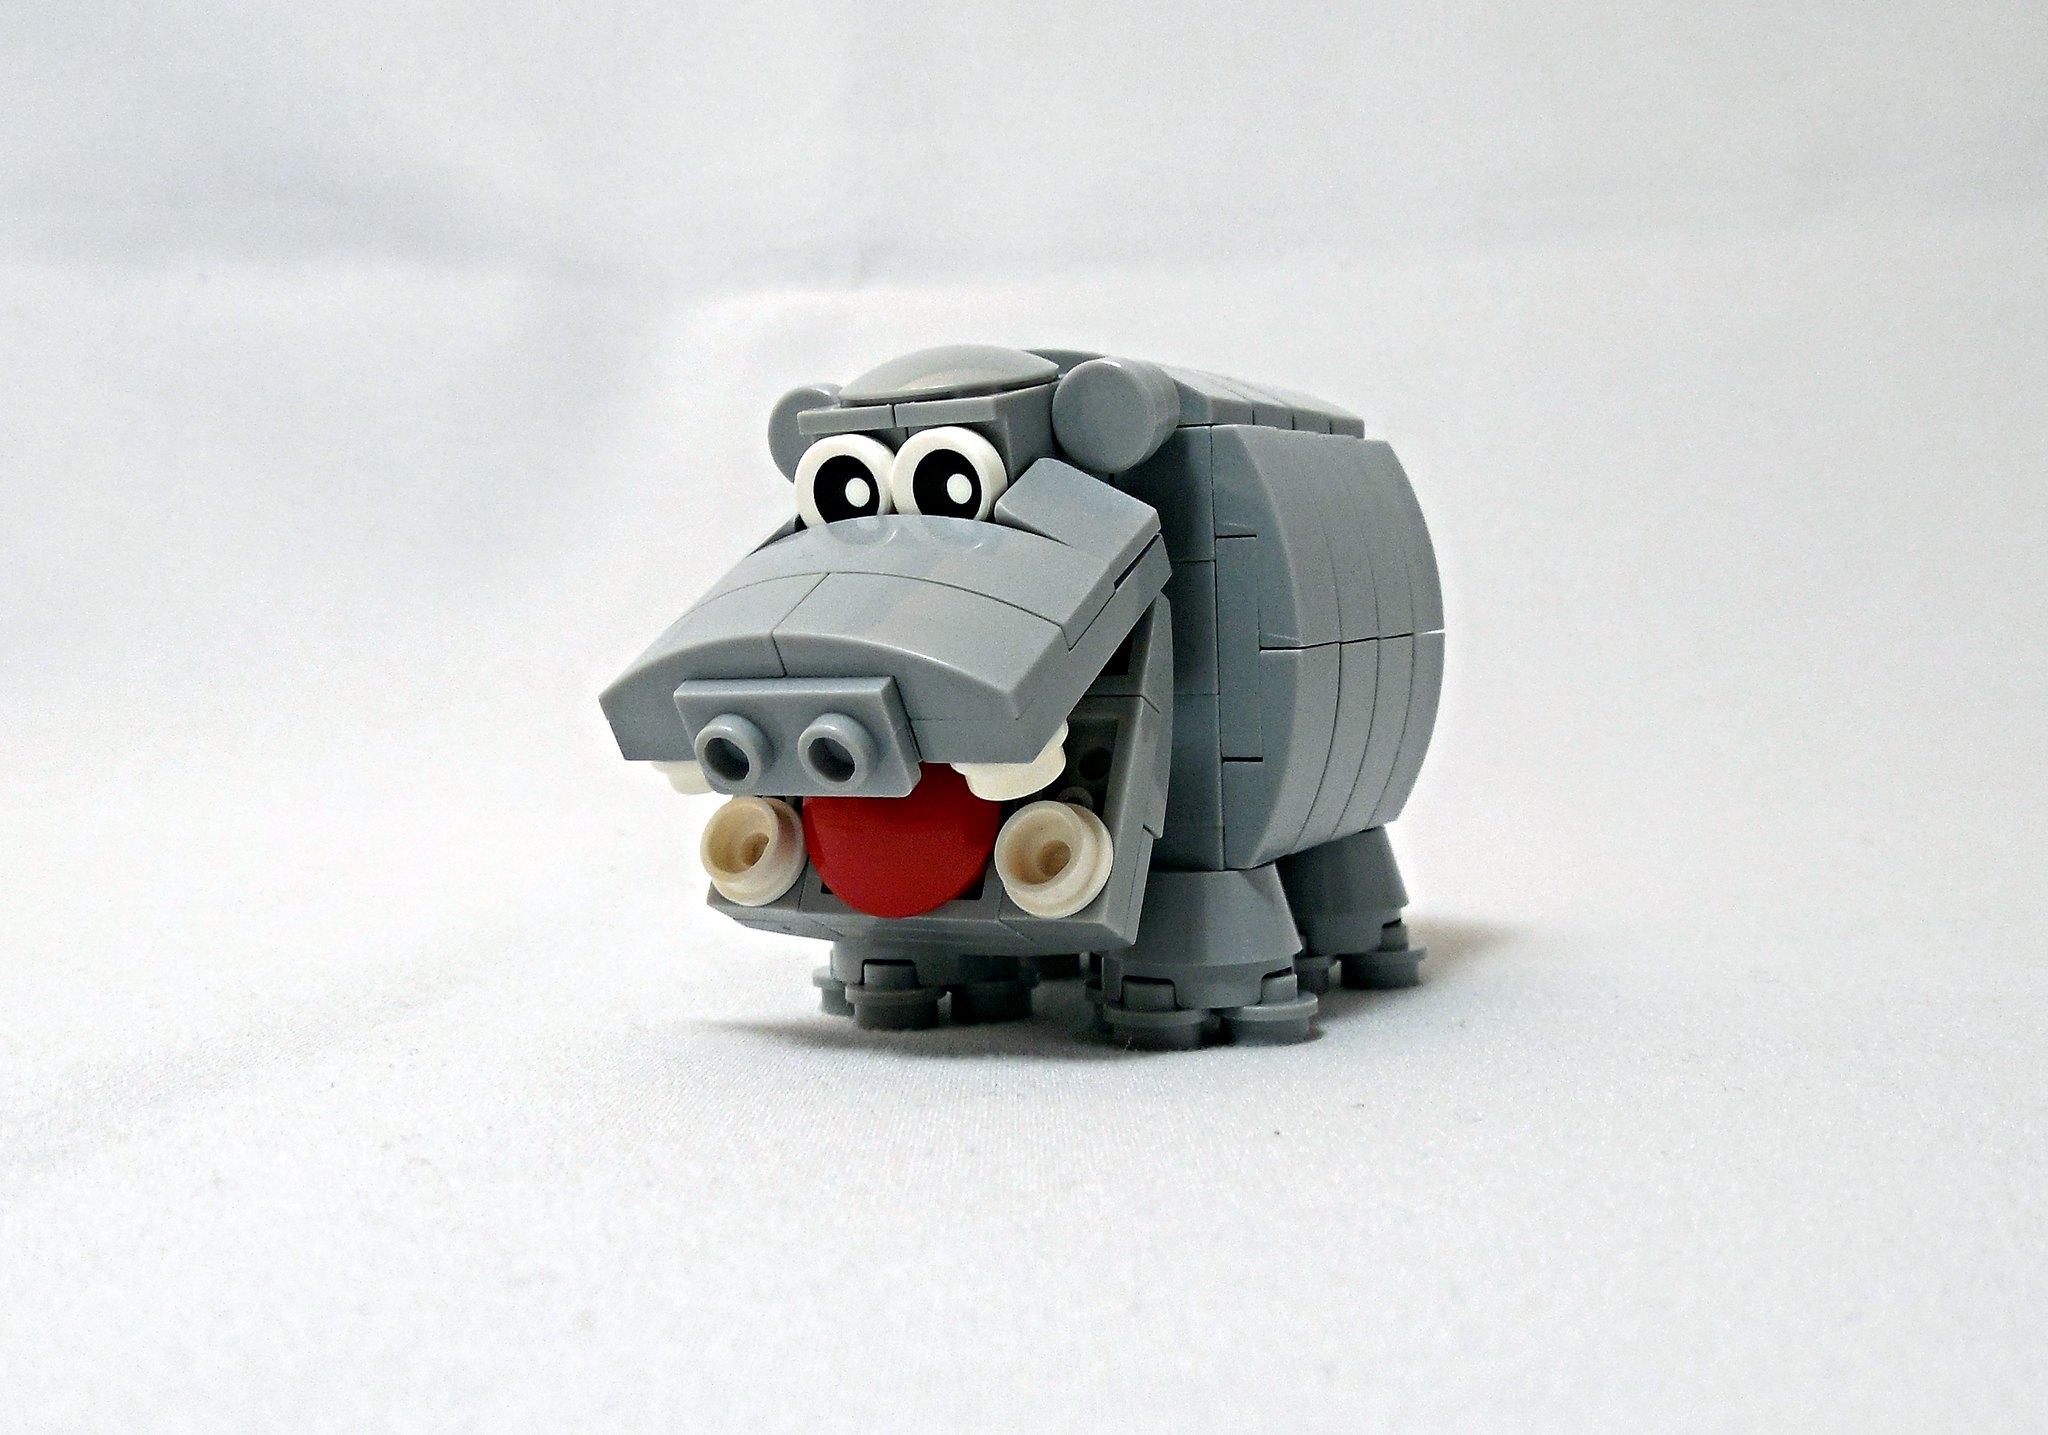 LEGO® MOC by Vitreolum: Hippo